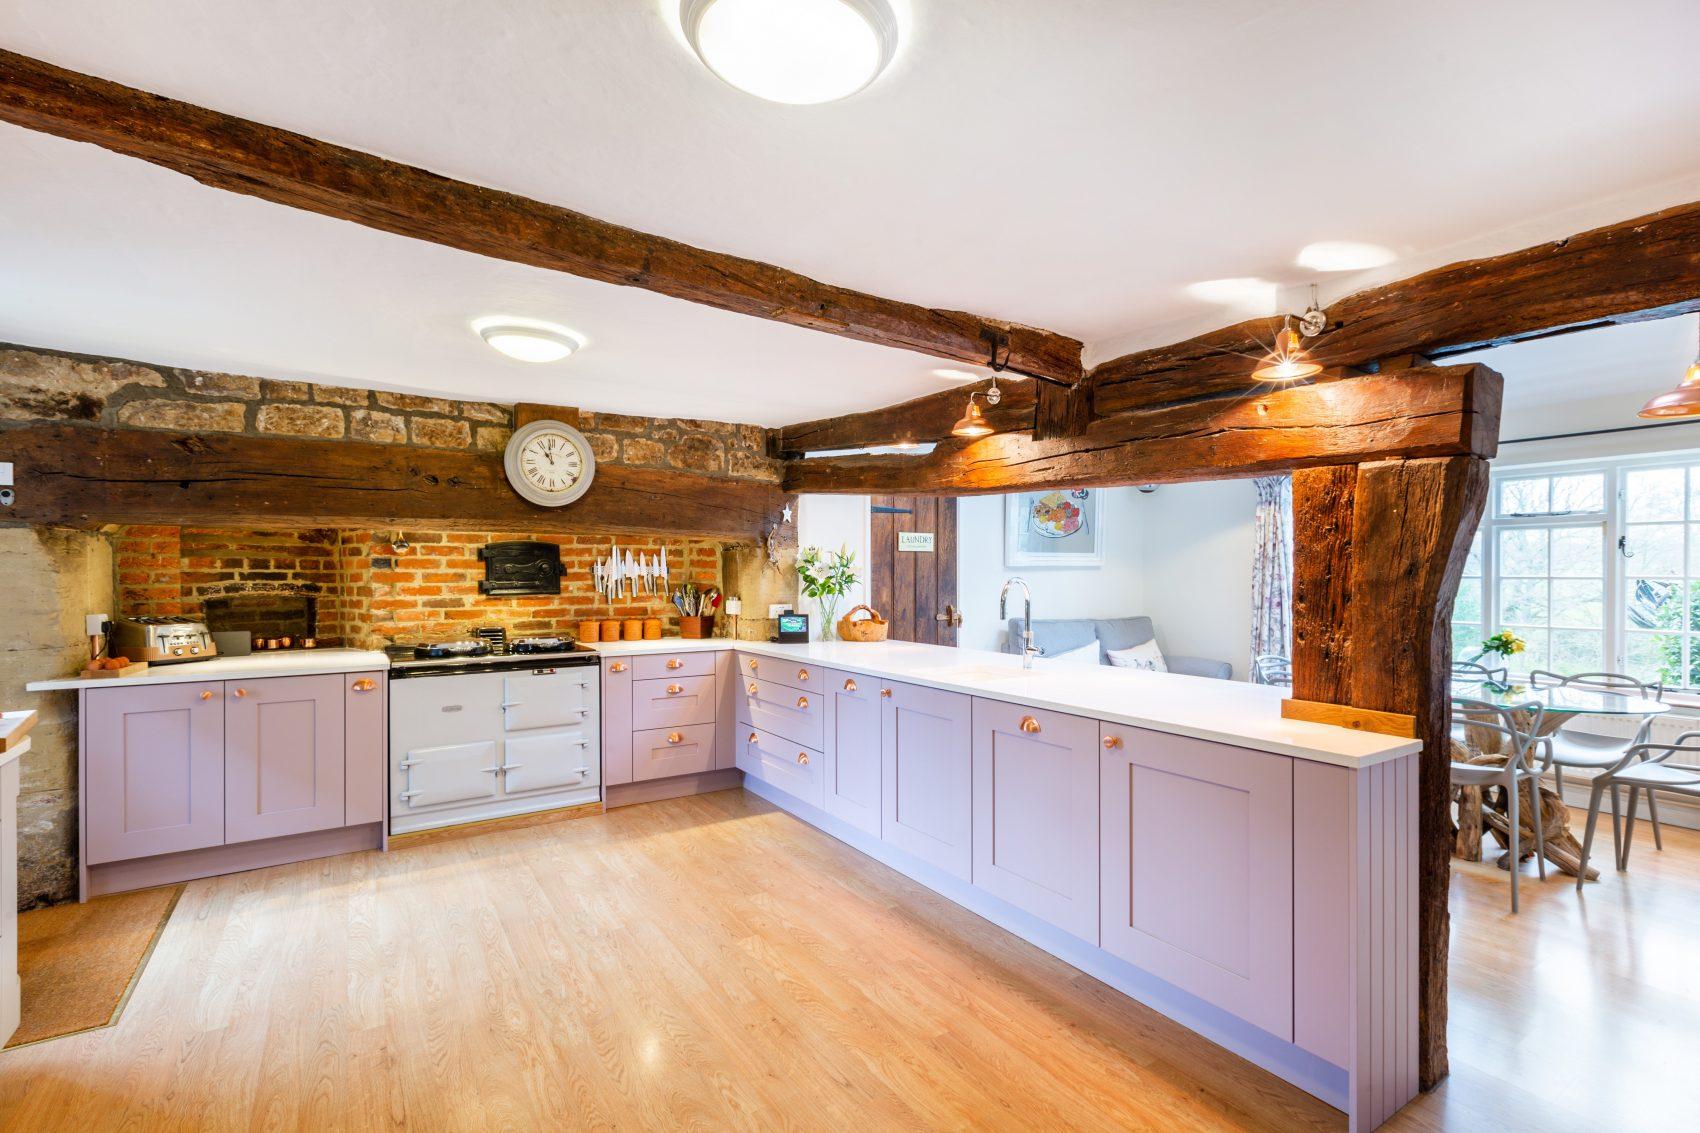 farmhouse shaker kitchen design in pink